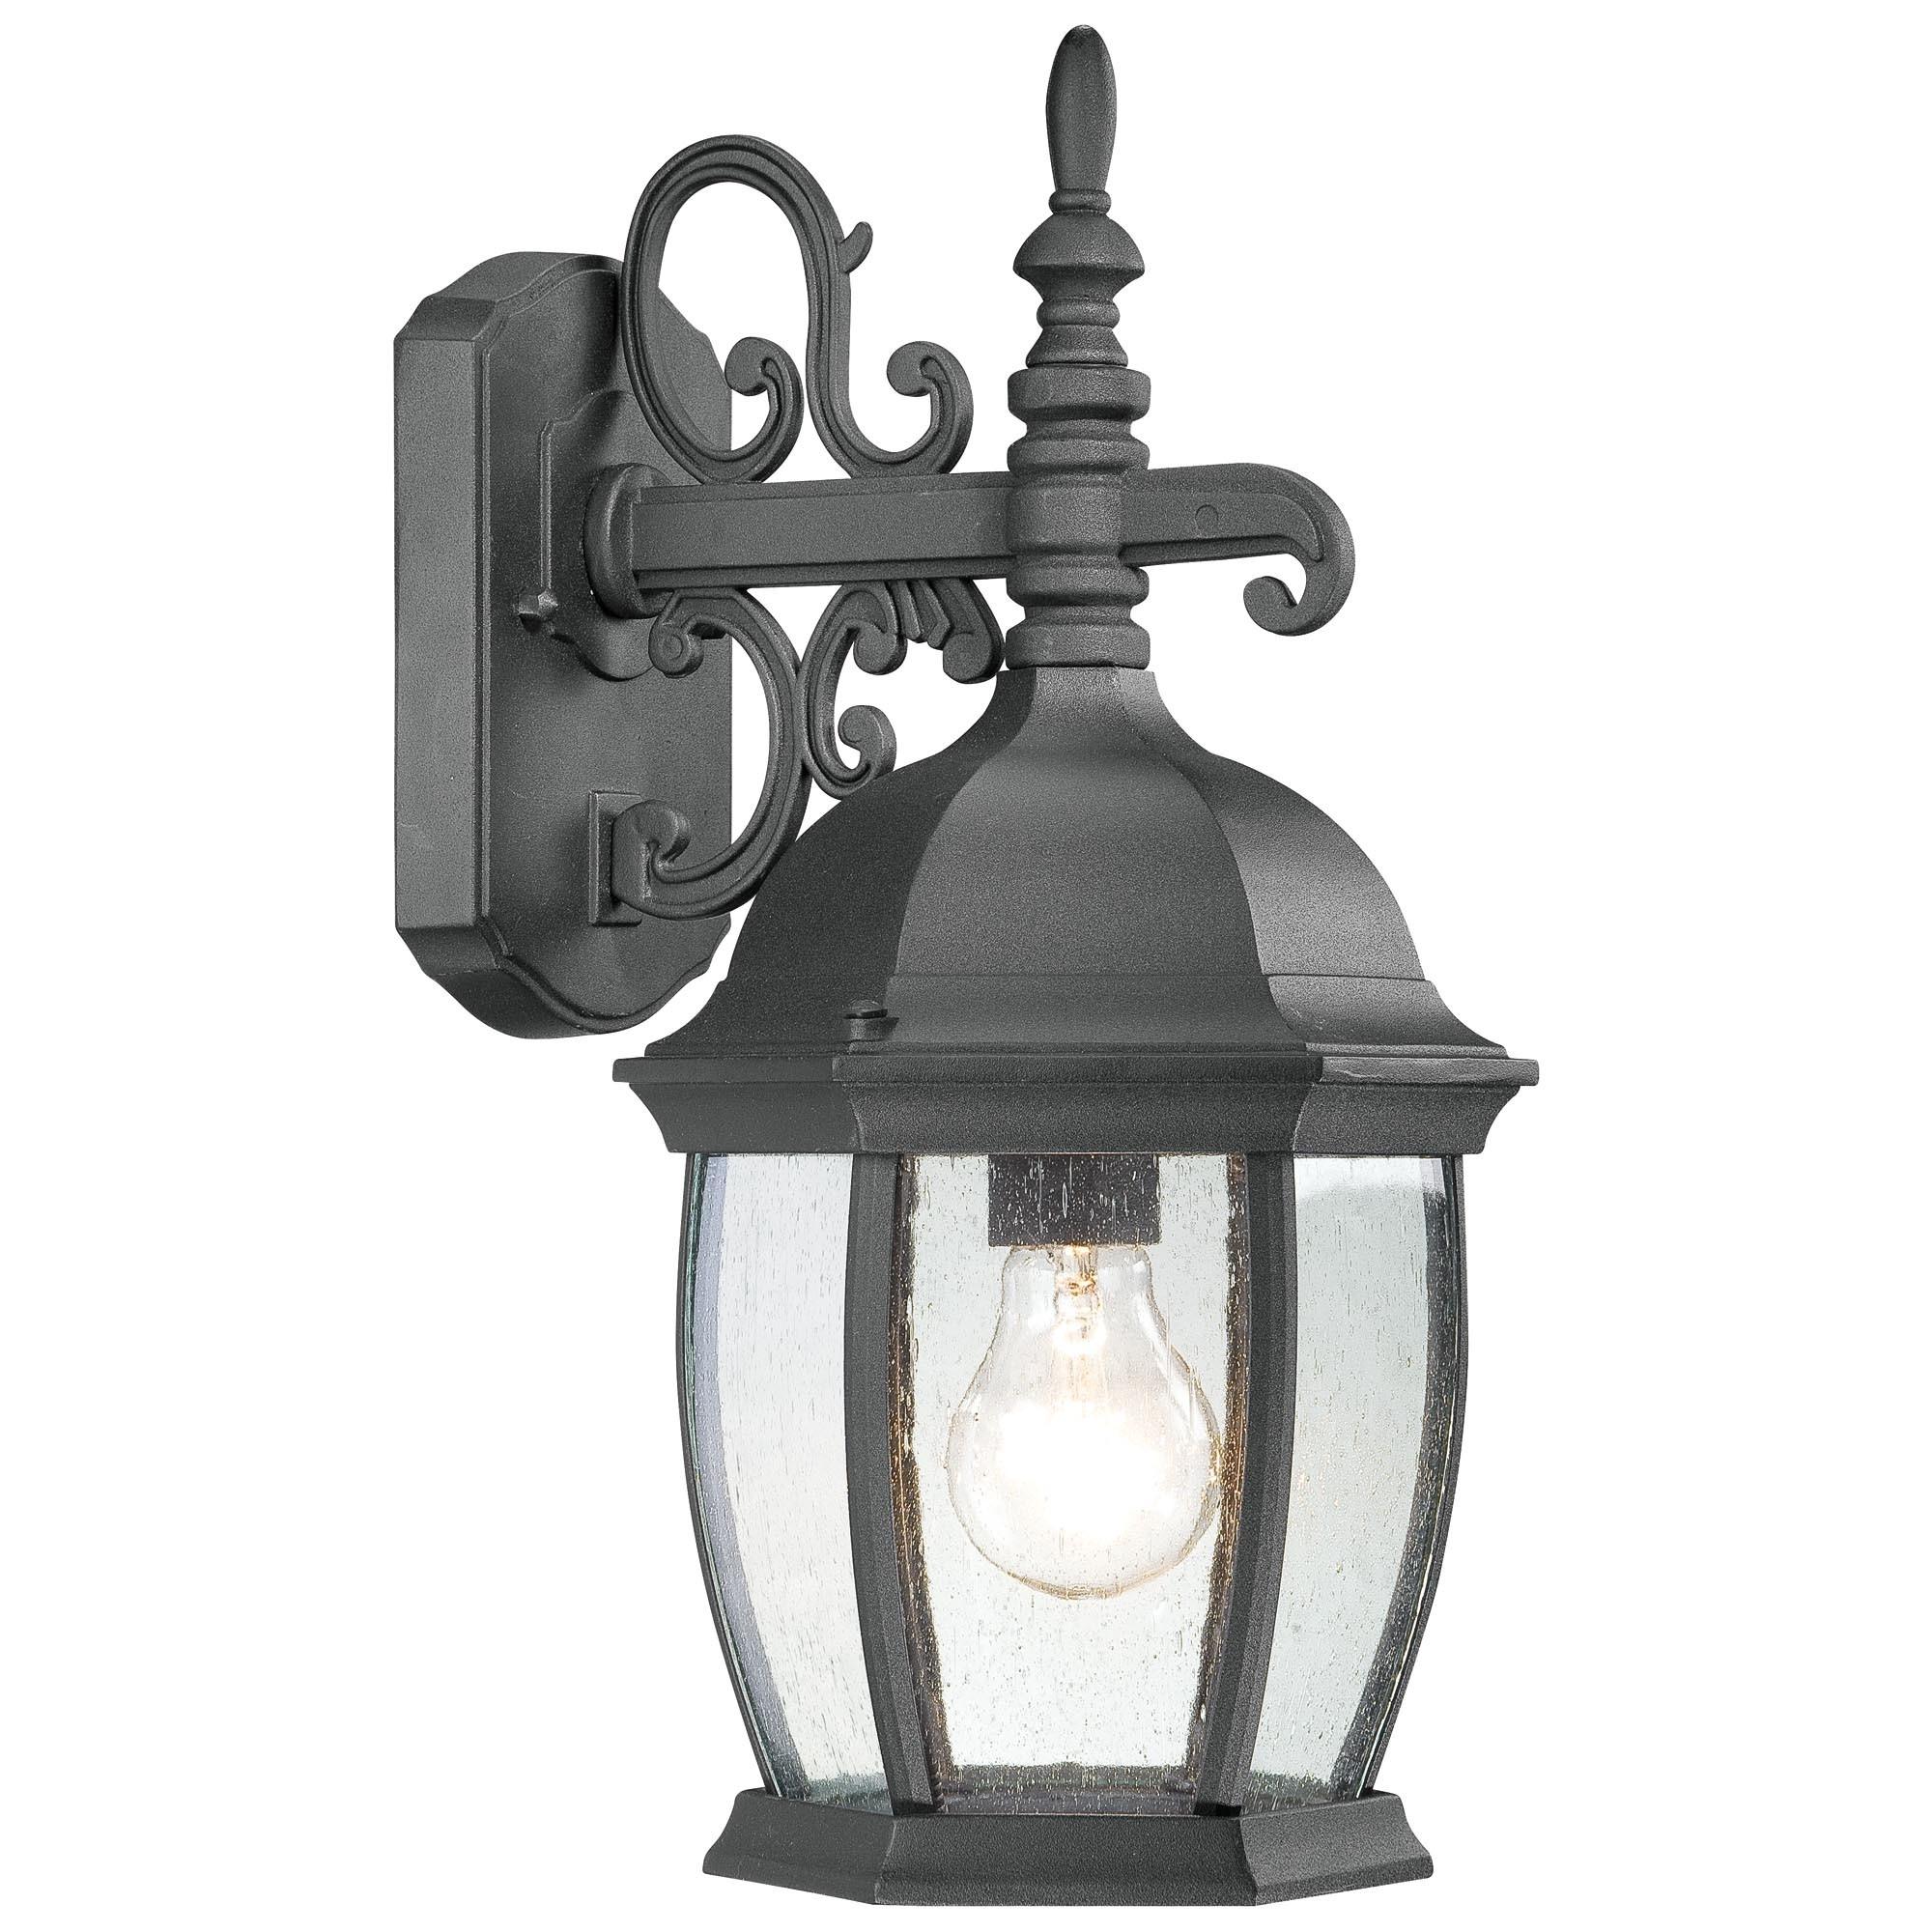 Popular Fixtures Light : Outdoor Light Fixtures Glass Replacements With Outdoor Lighting Japanese Lanterns (View 11 of 20)